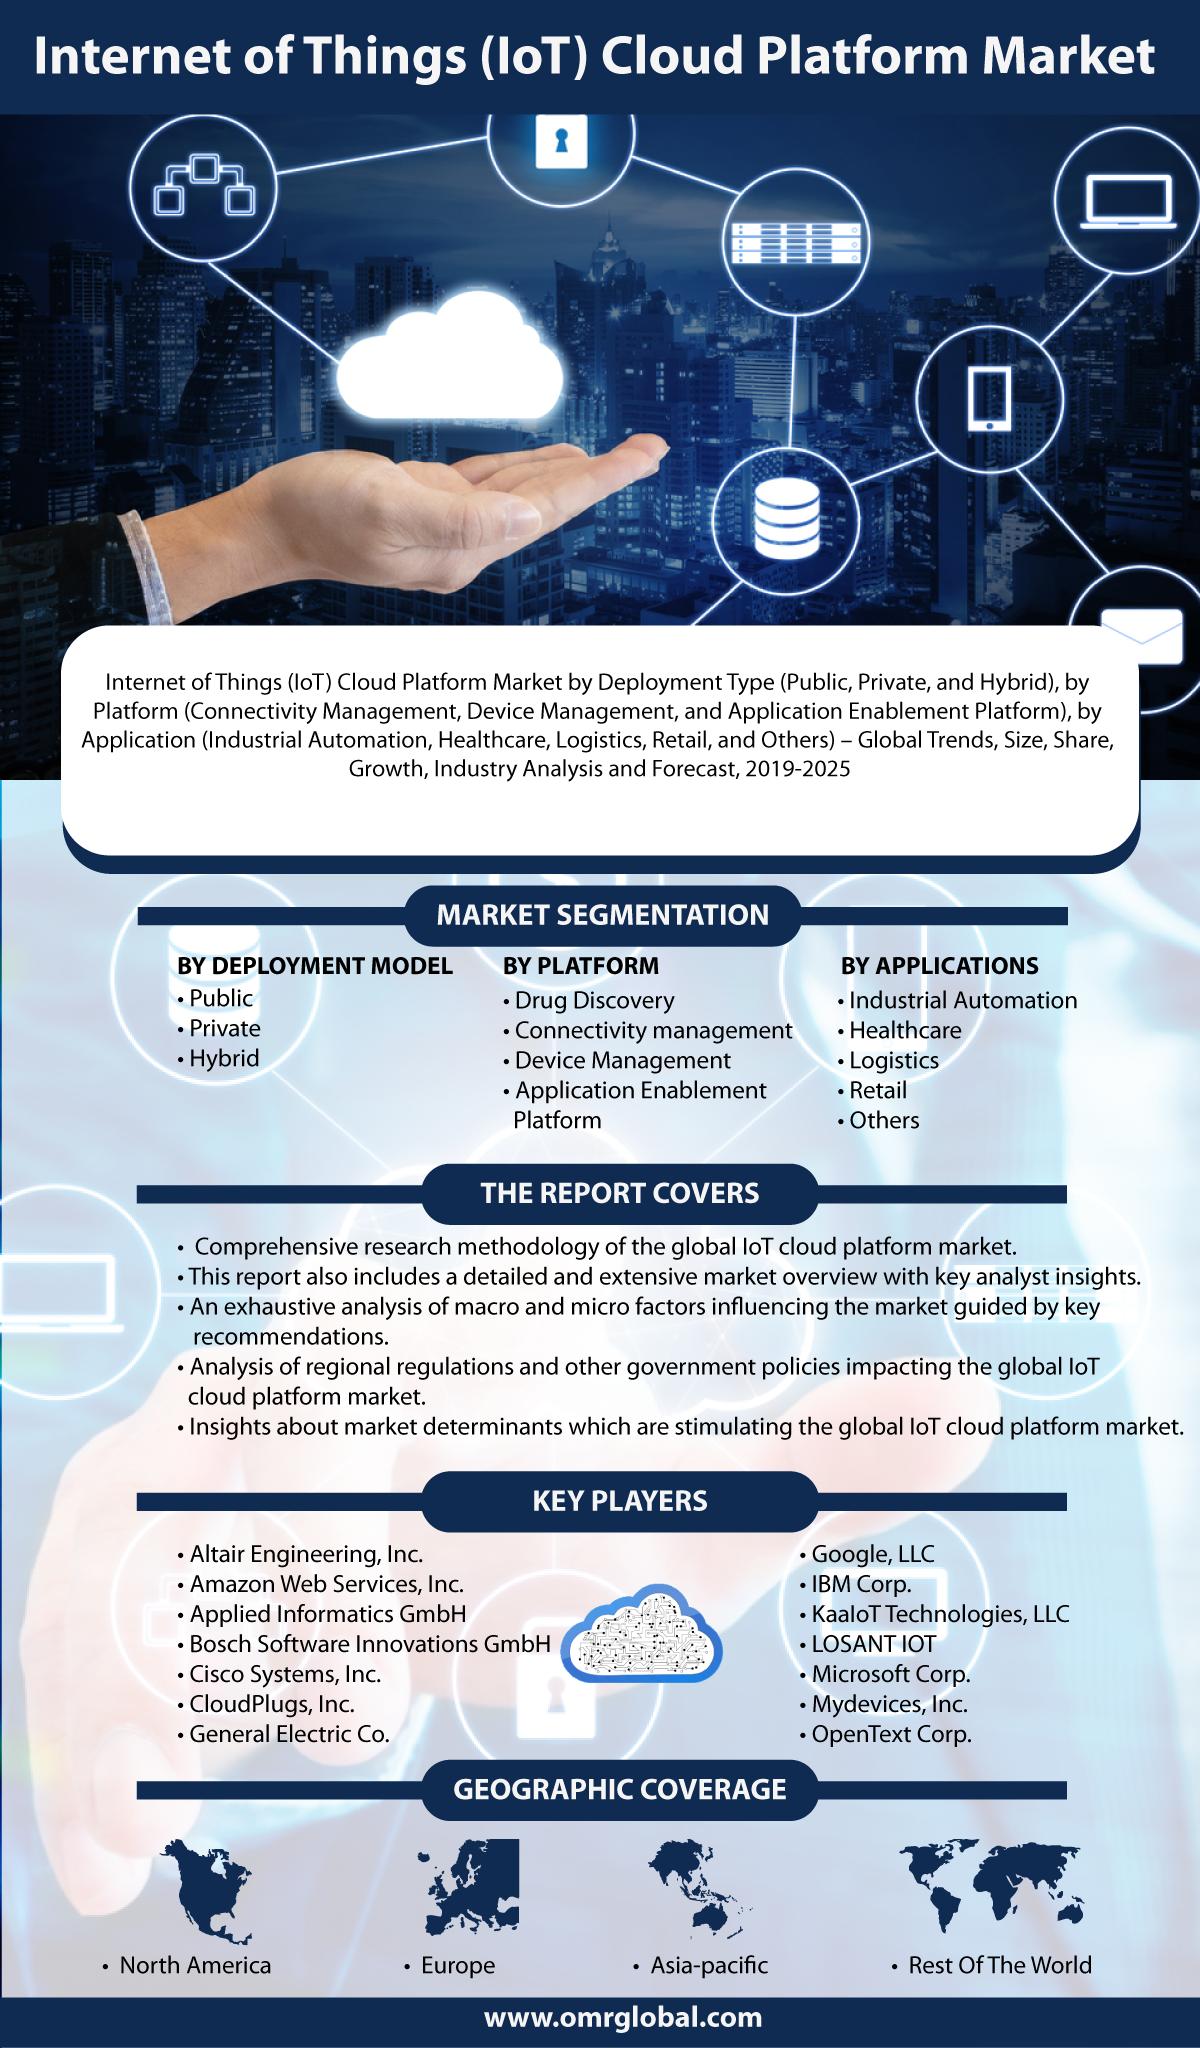 Iot Cloud Platform Market Size Share Growth Forecast To 2025 Iot Cloud Platform Marketing